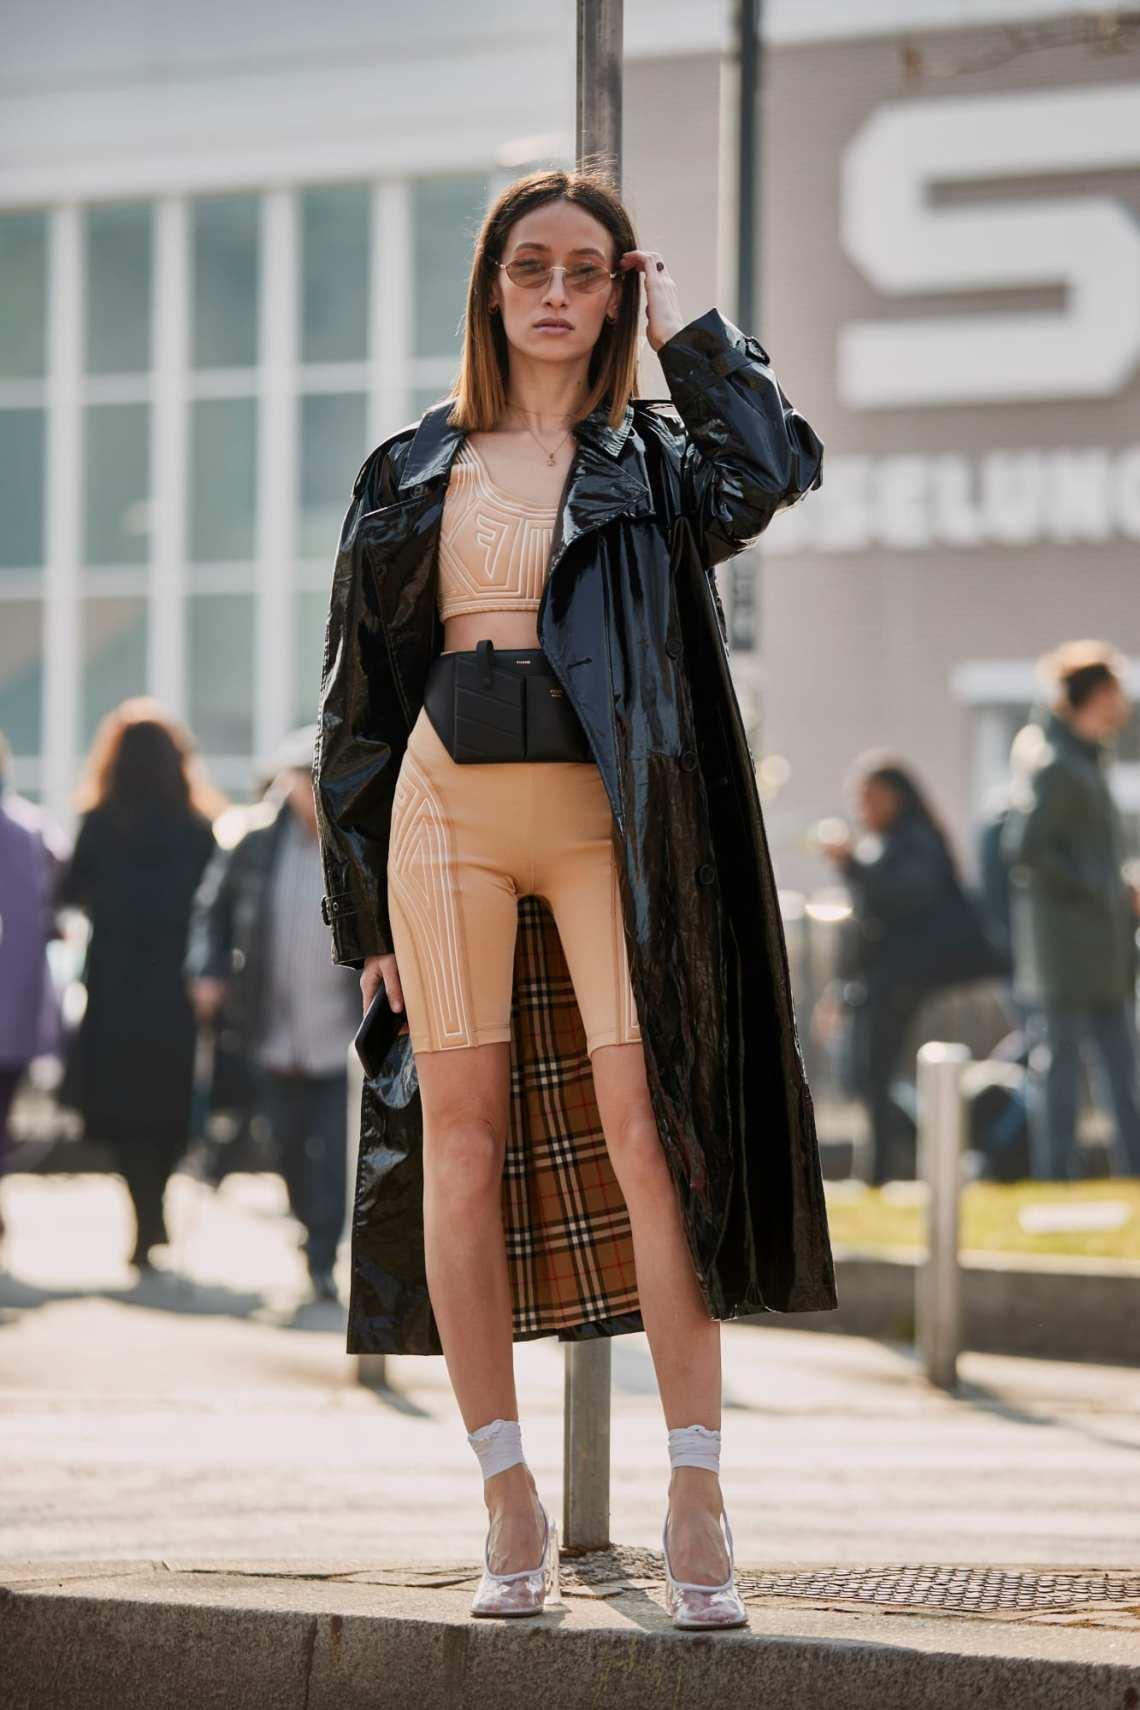 milan-fashion-week-fall-2019-street-style-day-2-48